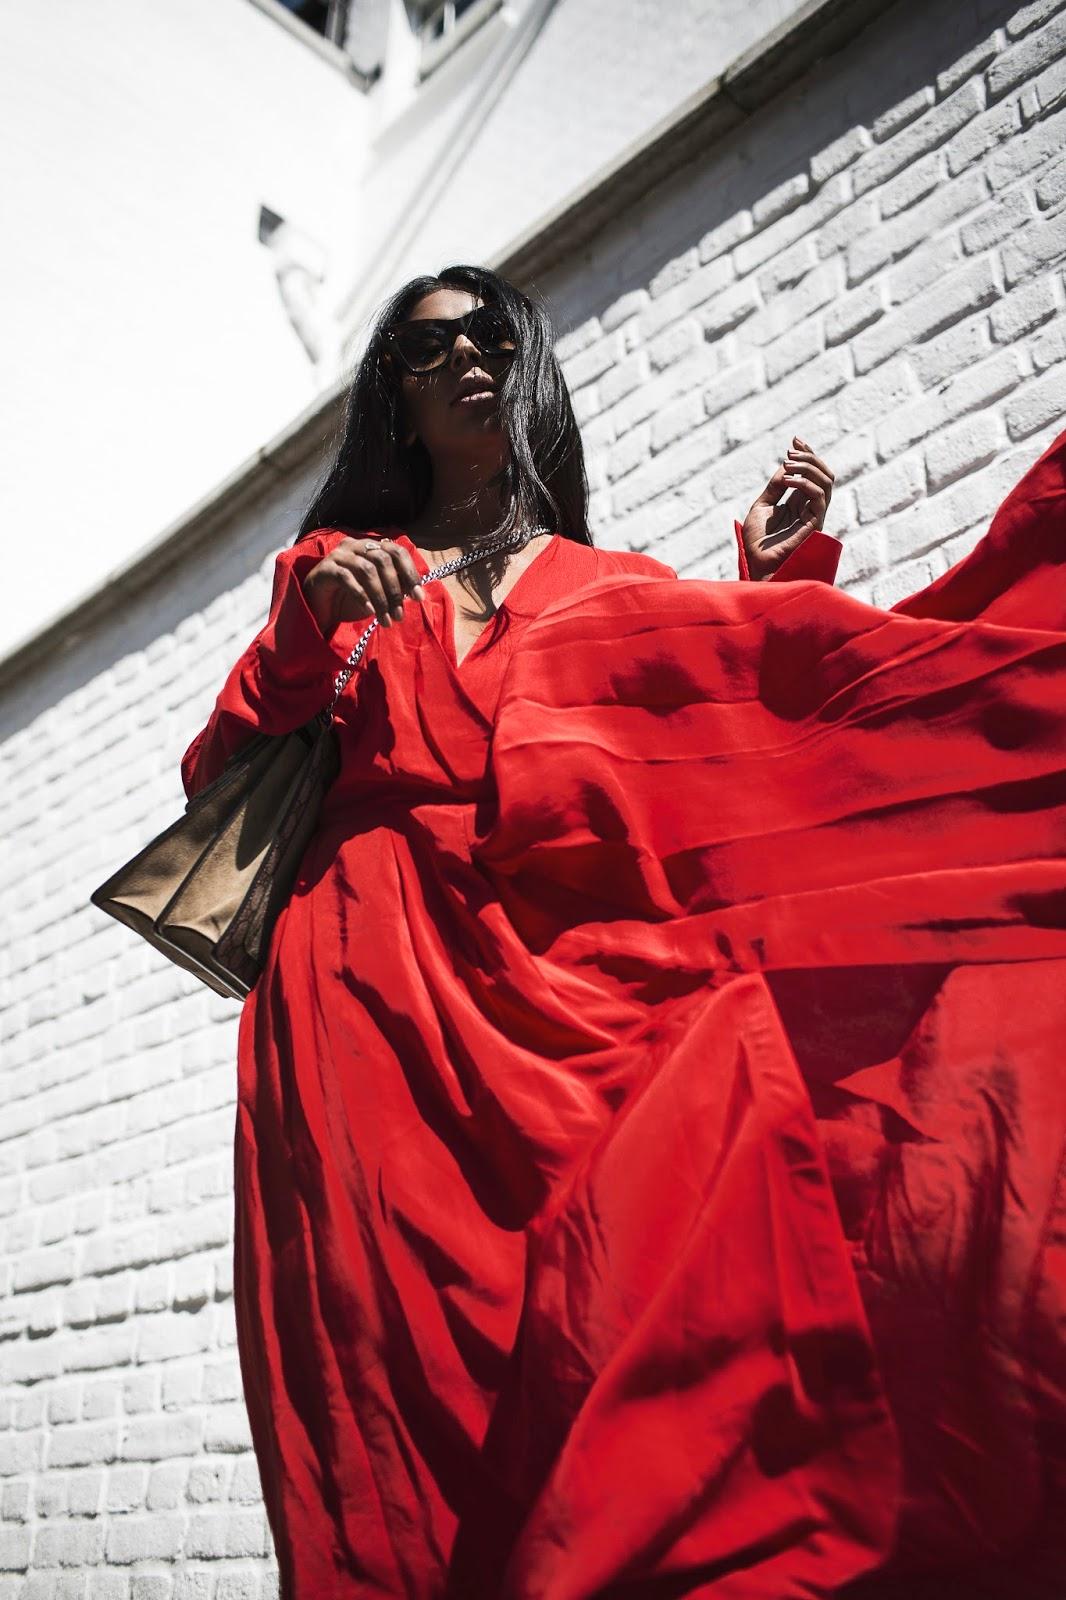 OVERSIZED RED DRESS